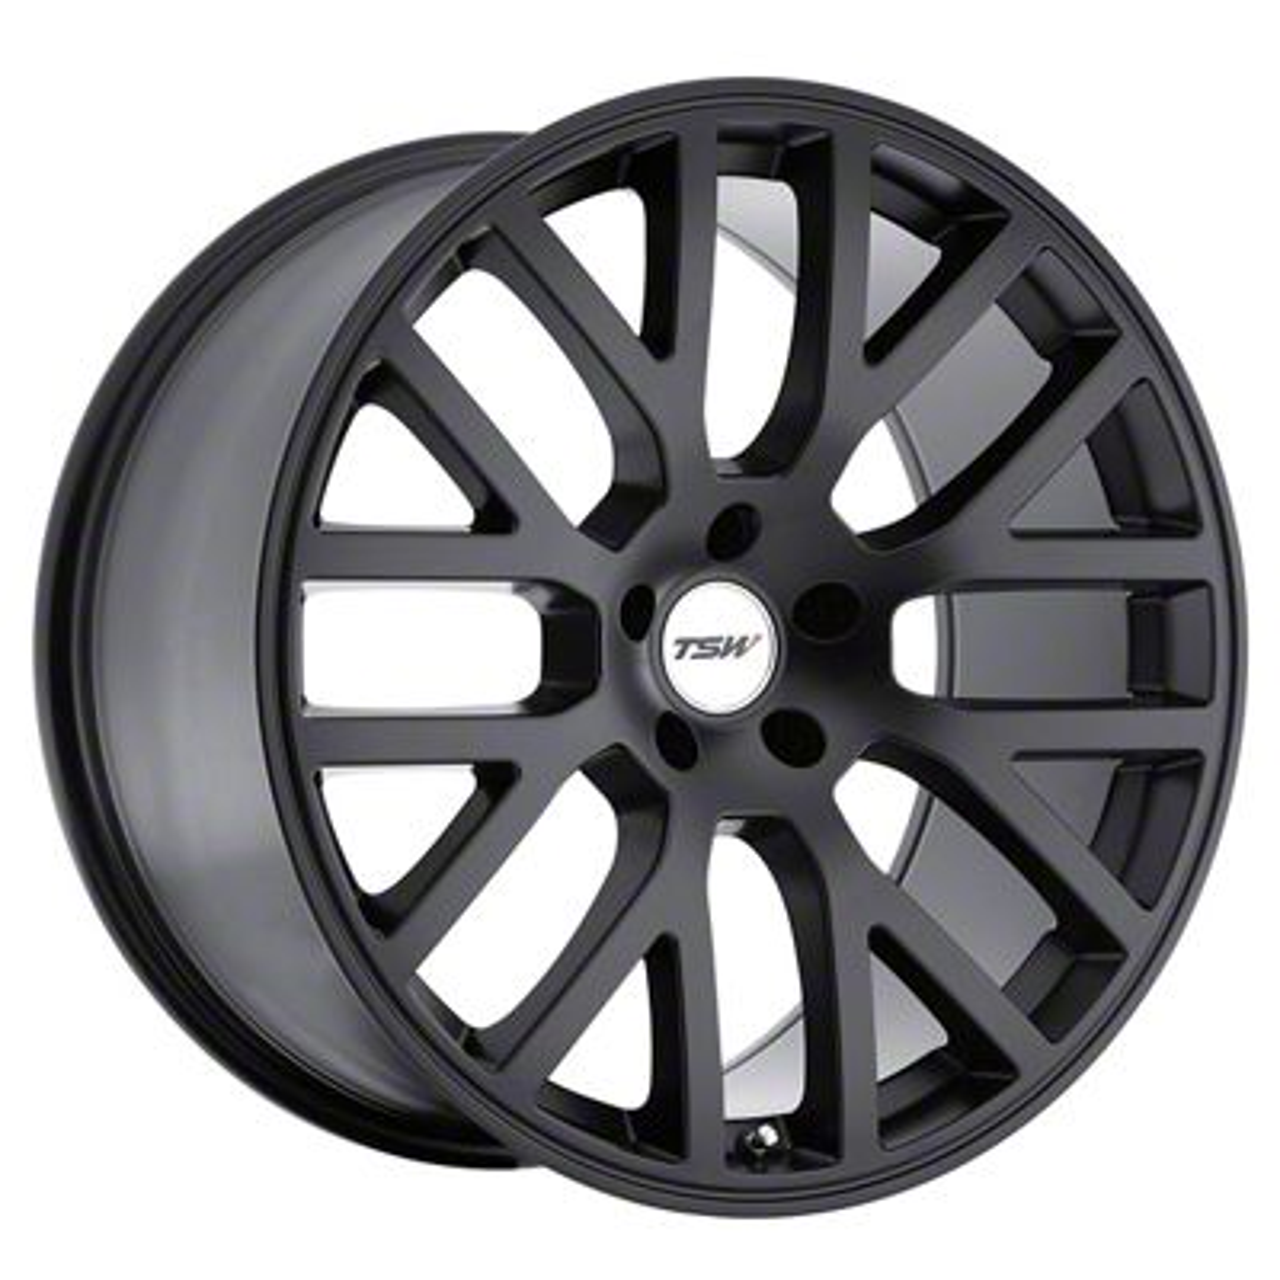 TSW Donington Matte Black Wheel - 20x10 (15-19 GT, EcoBoost, V6)